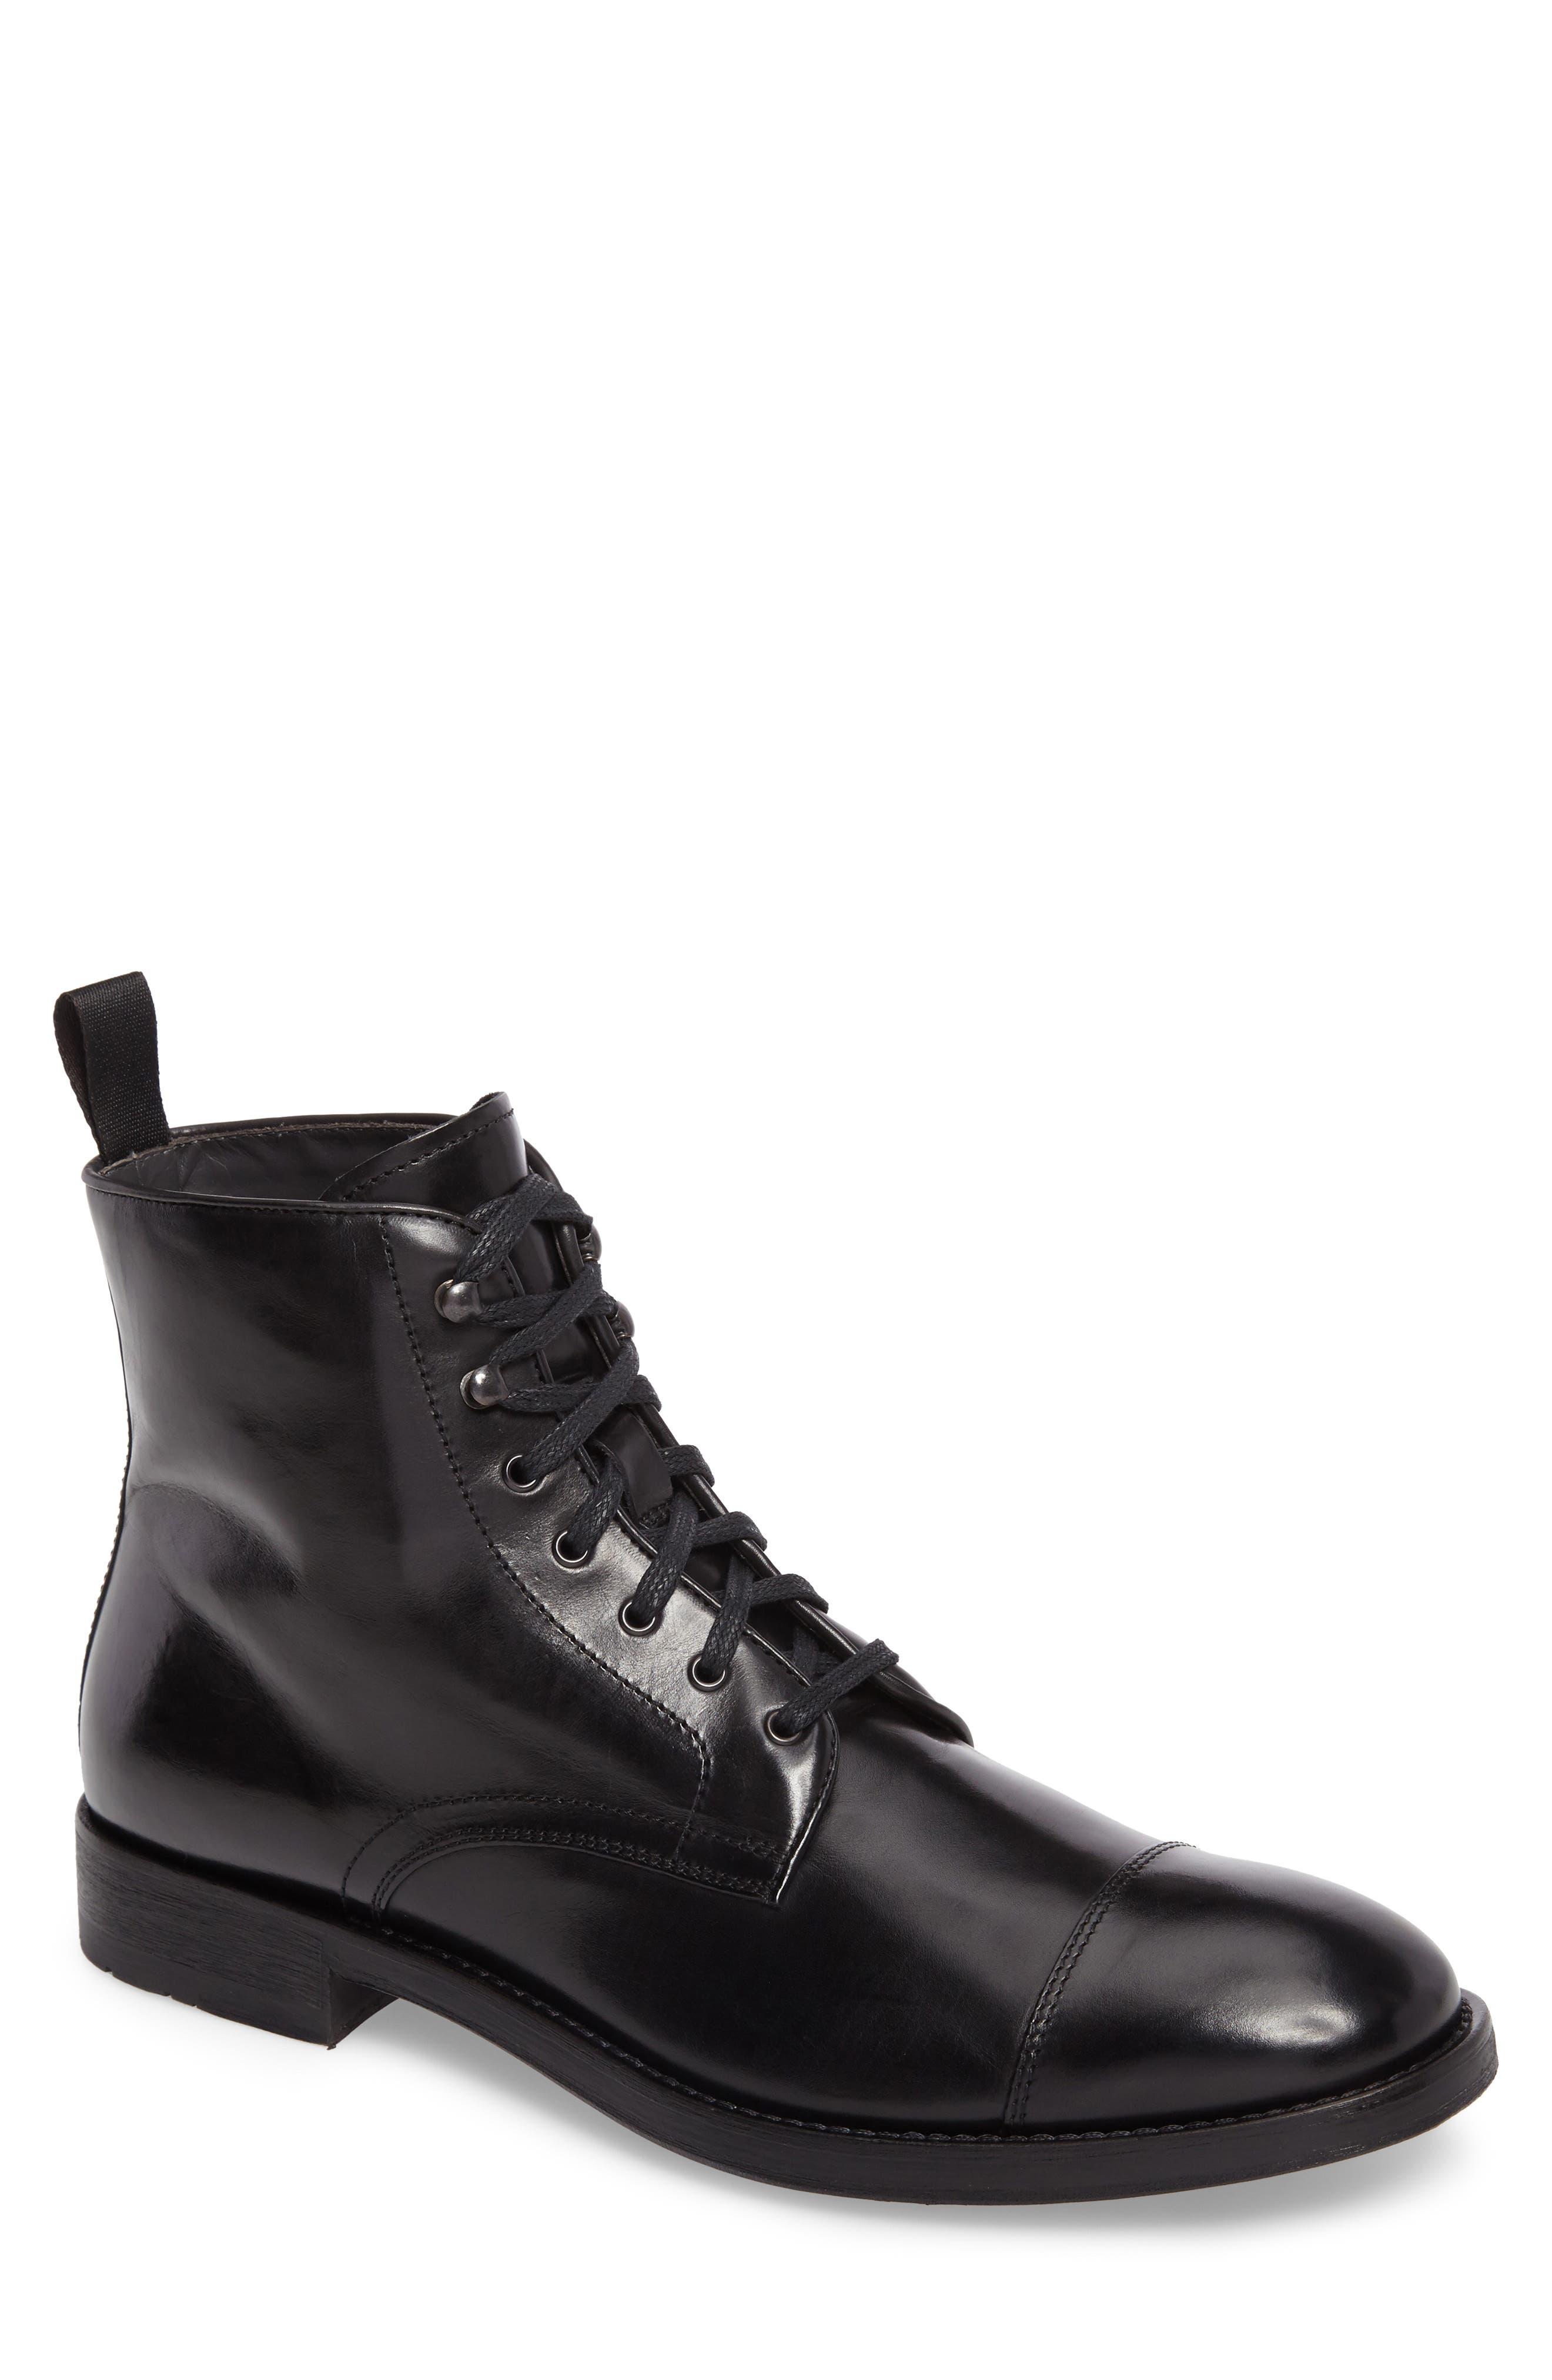 Bondfield Cap Toe Boot,                         Main,                         color, 001